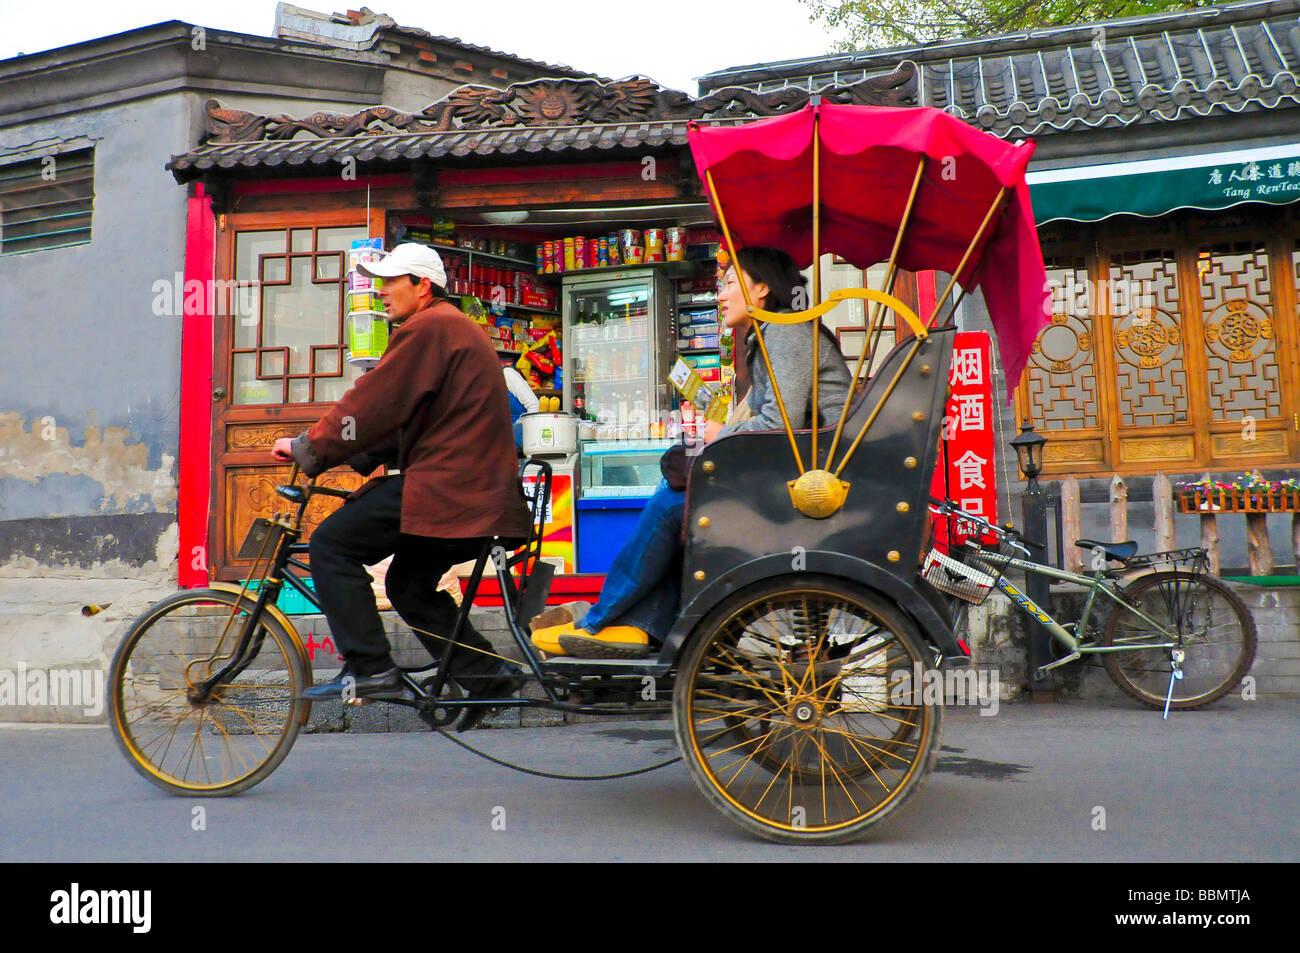 Rickshaw in a hutong Beijing - Stock Image